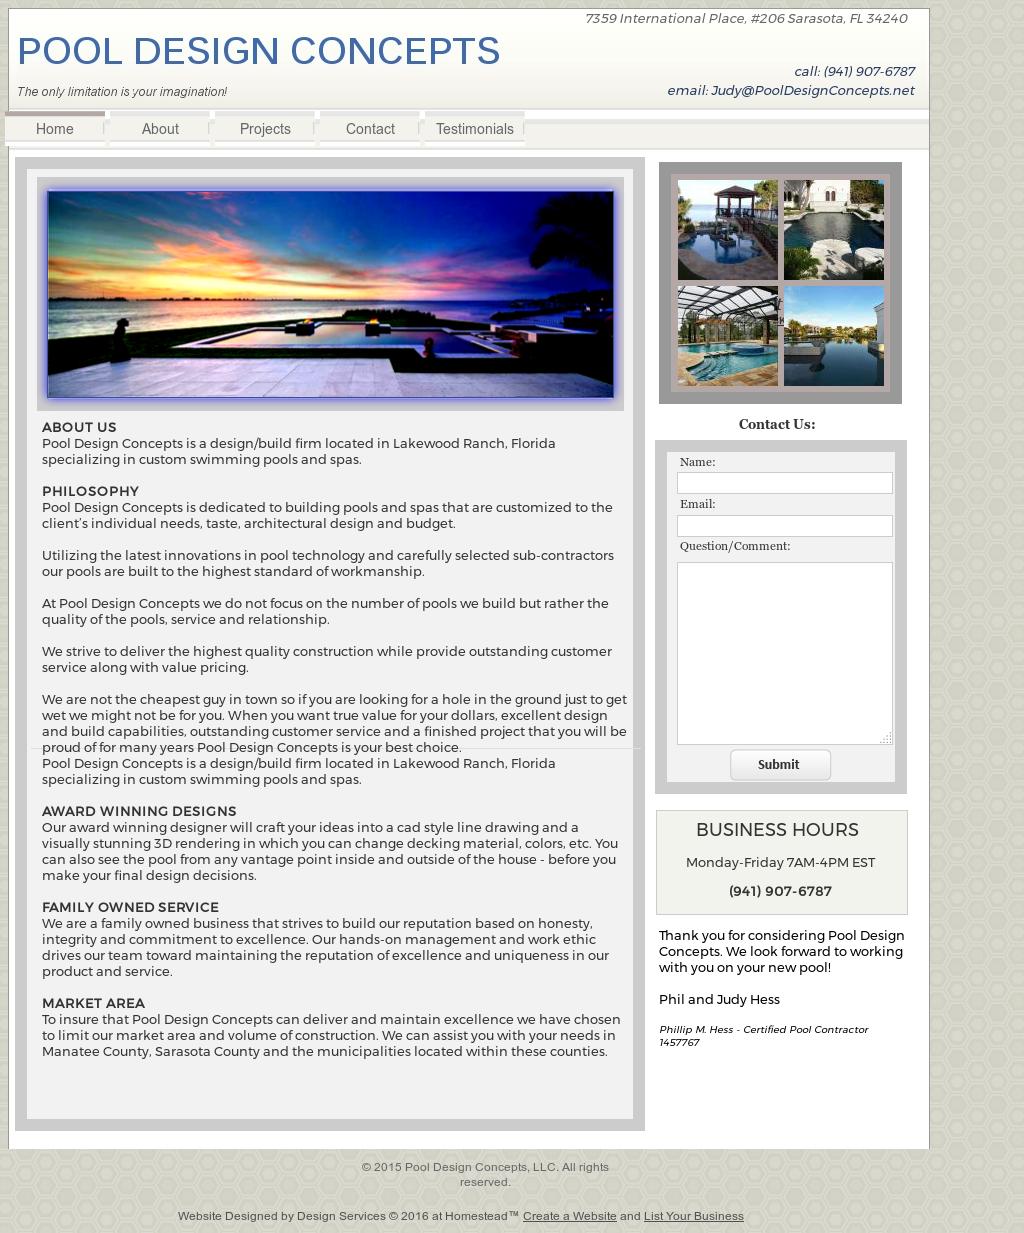 Pool Design Concepts Website History